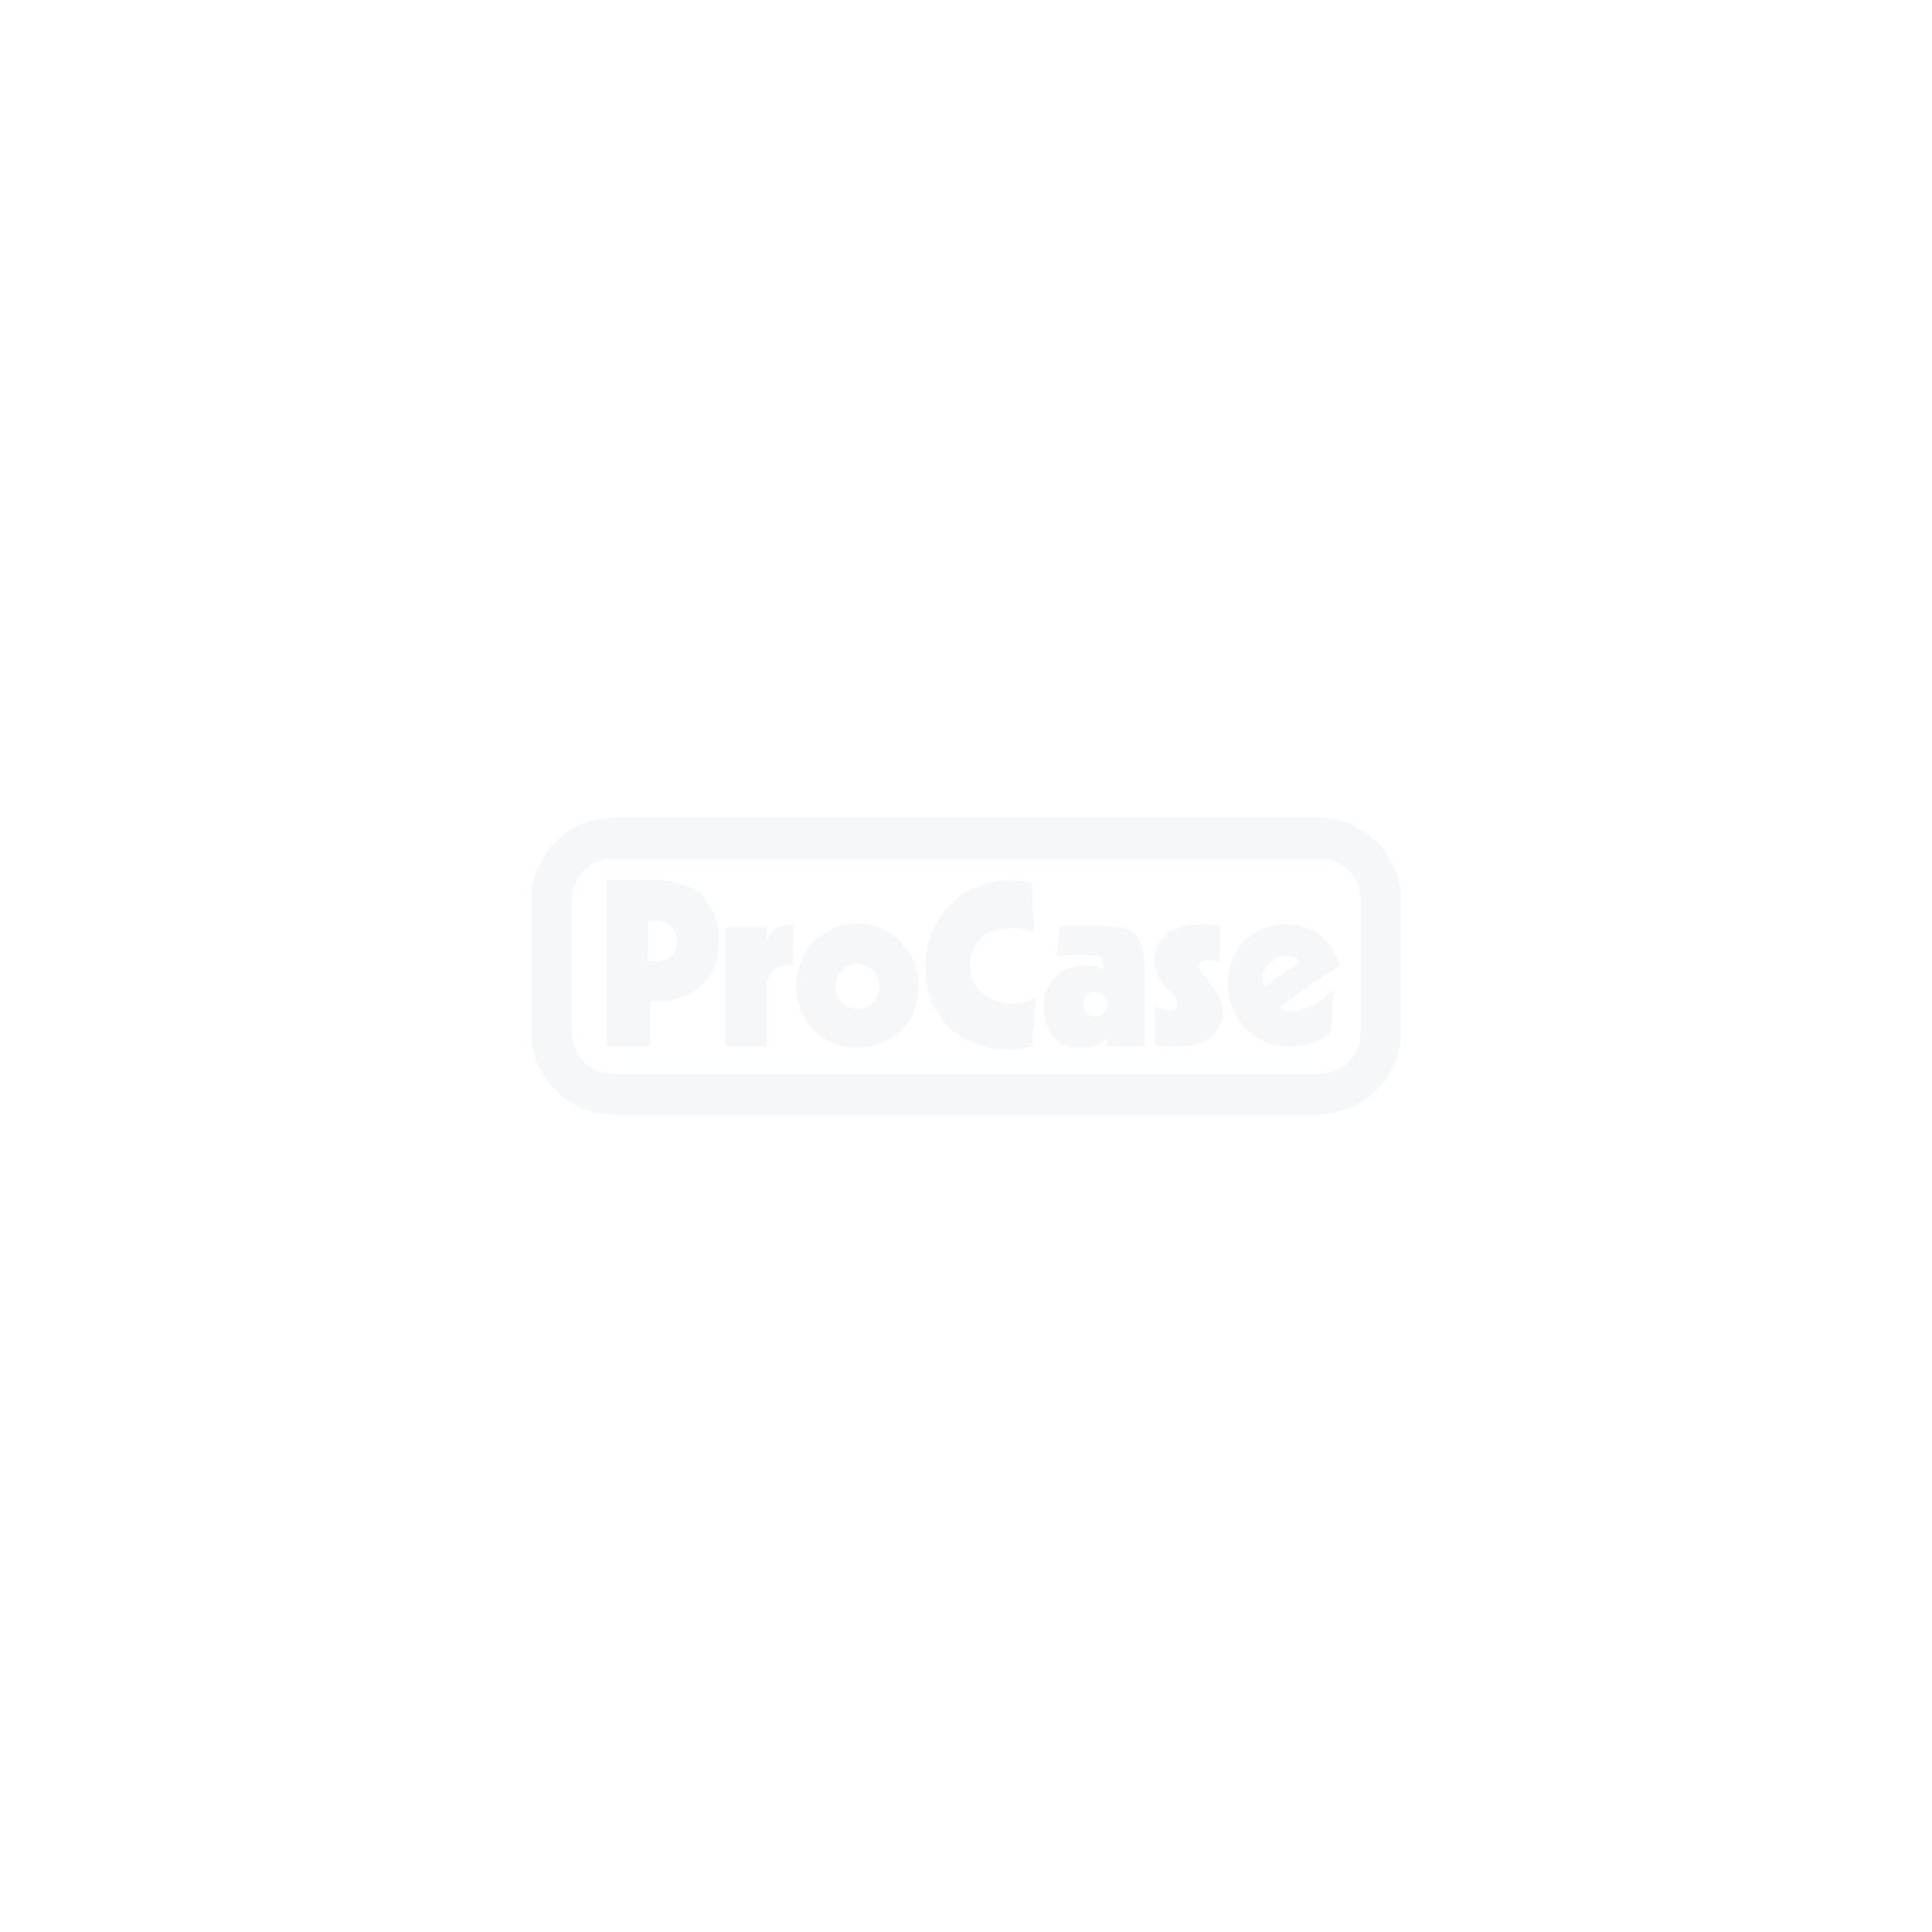 Stativ-Case / Hardware-Case 120